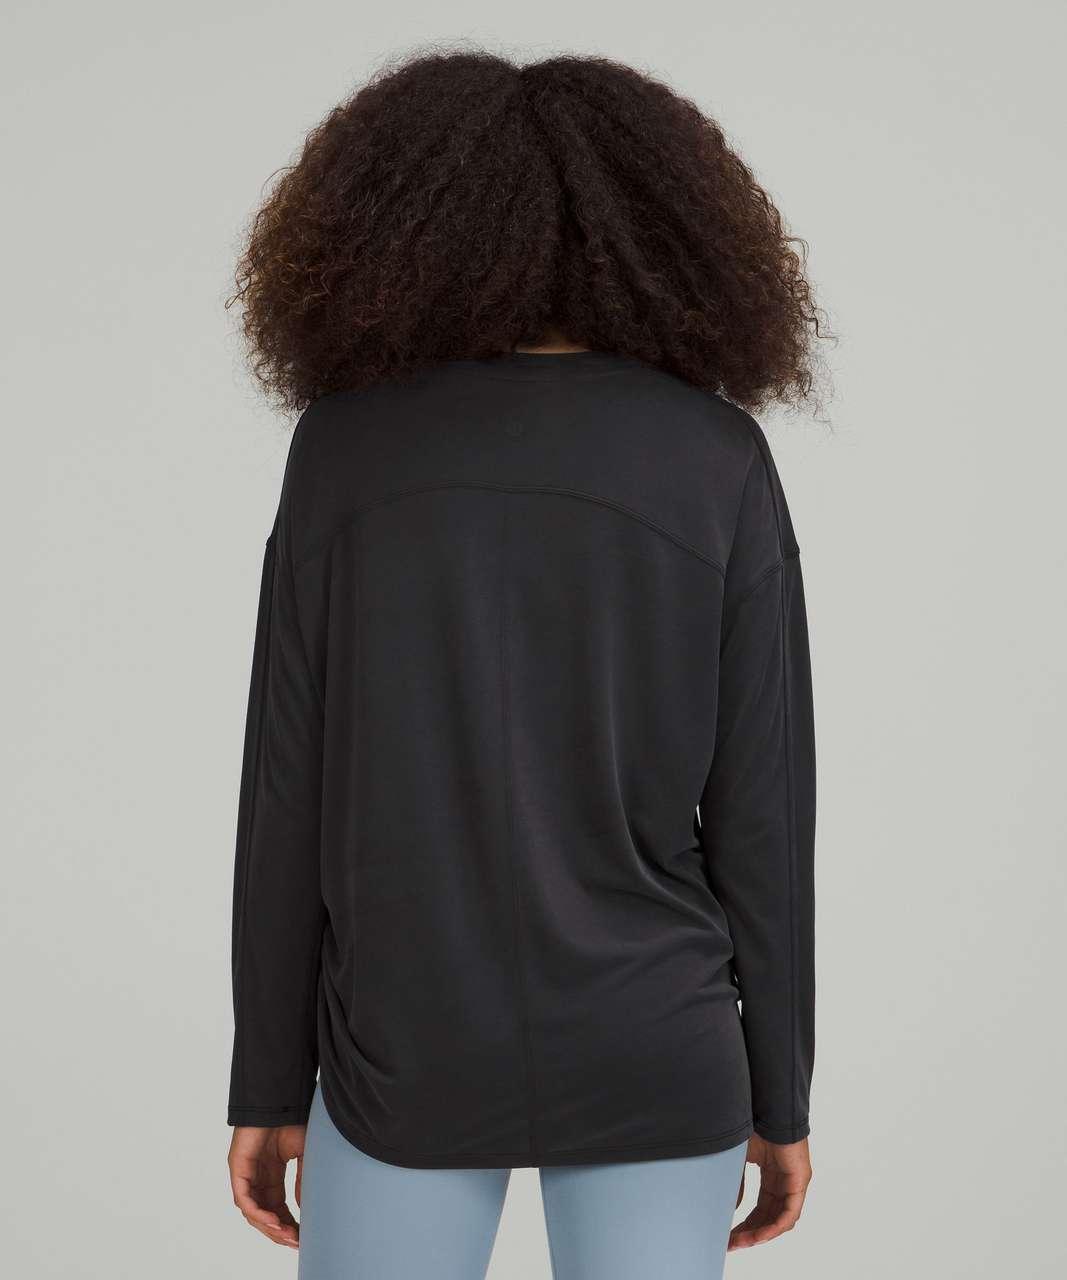 Lululemon Side Cinch Long Sleeve Crew - Black